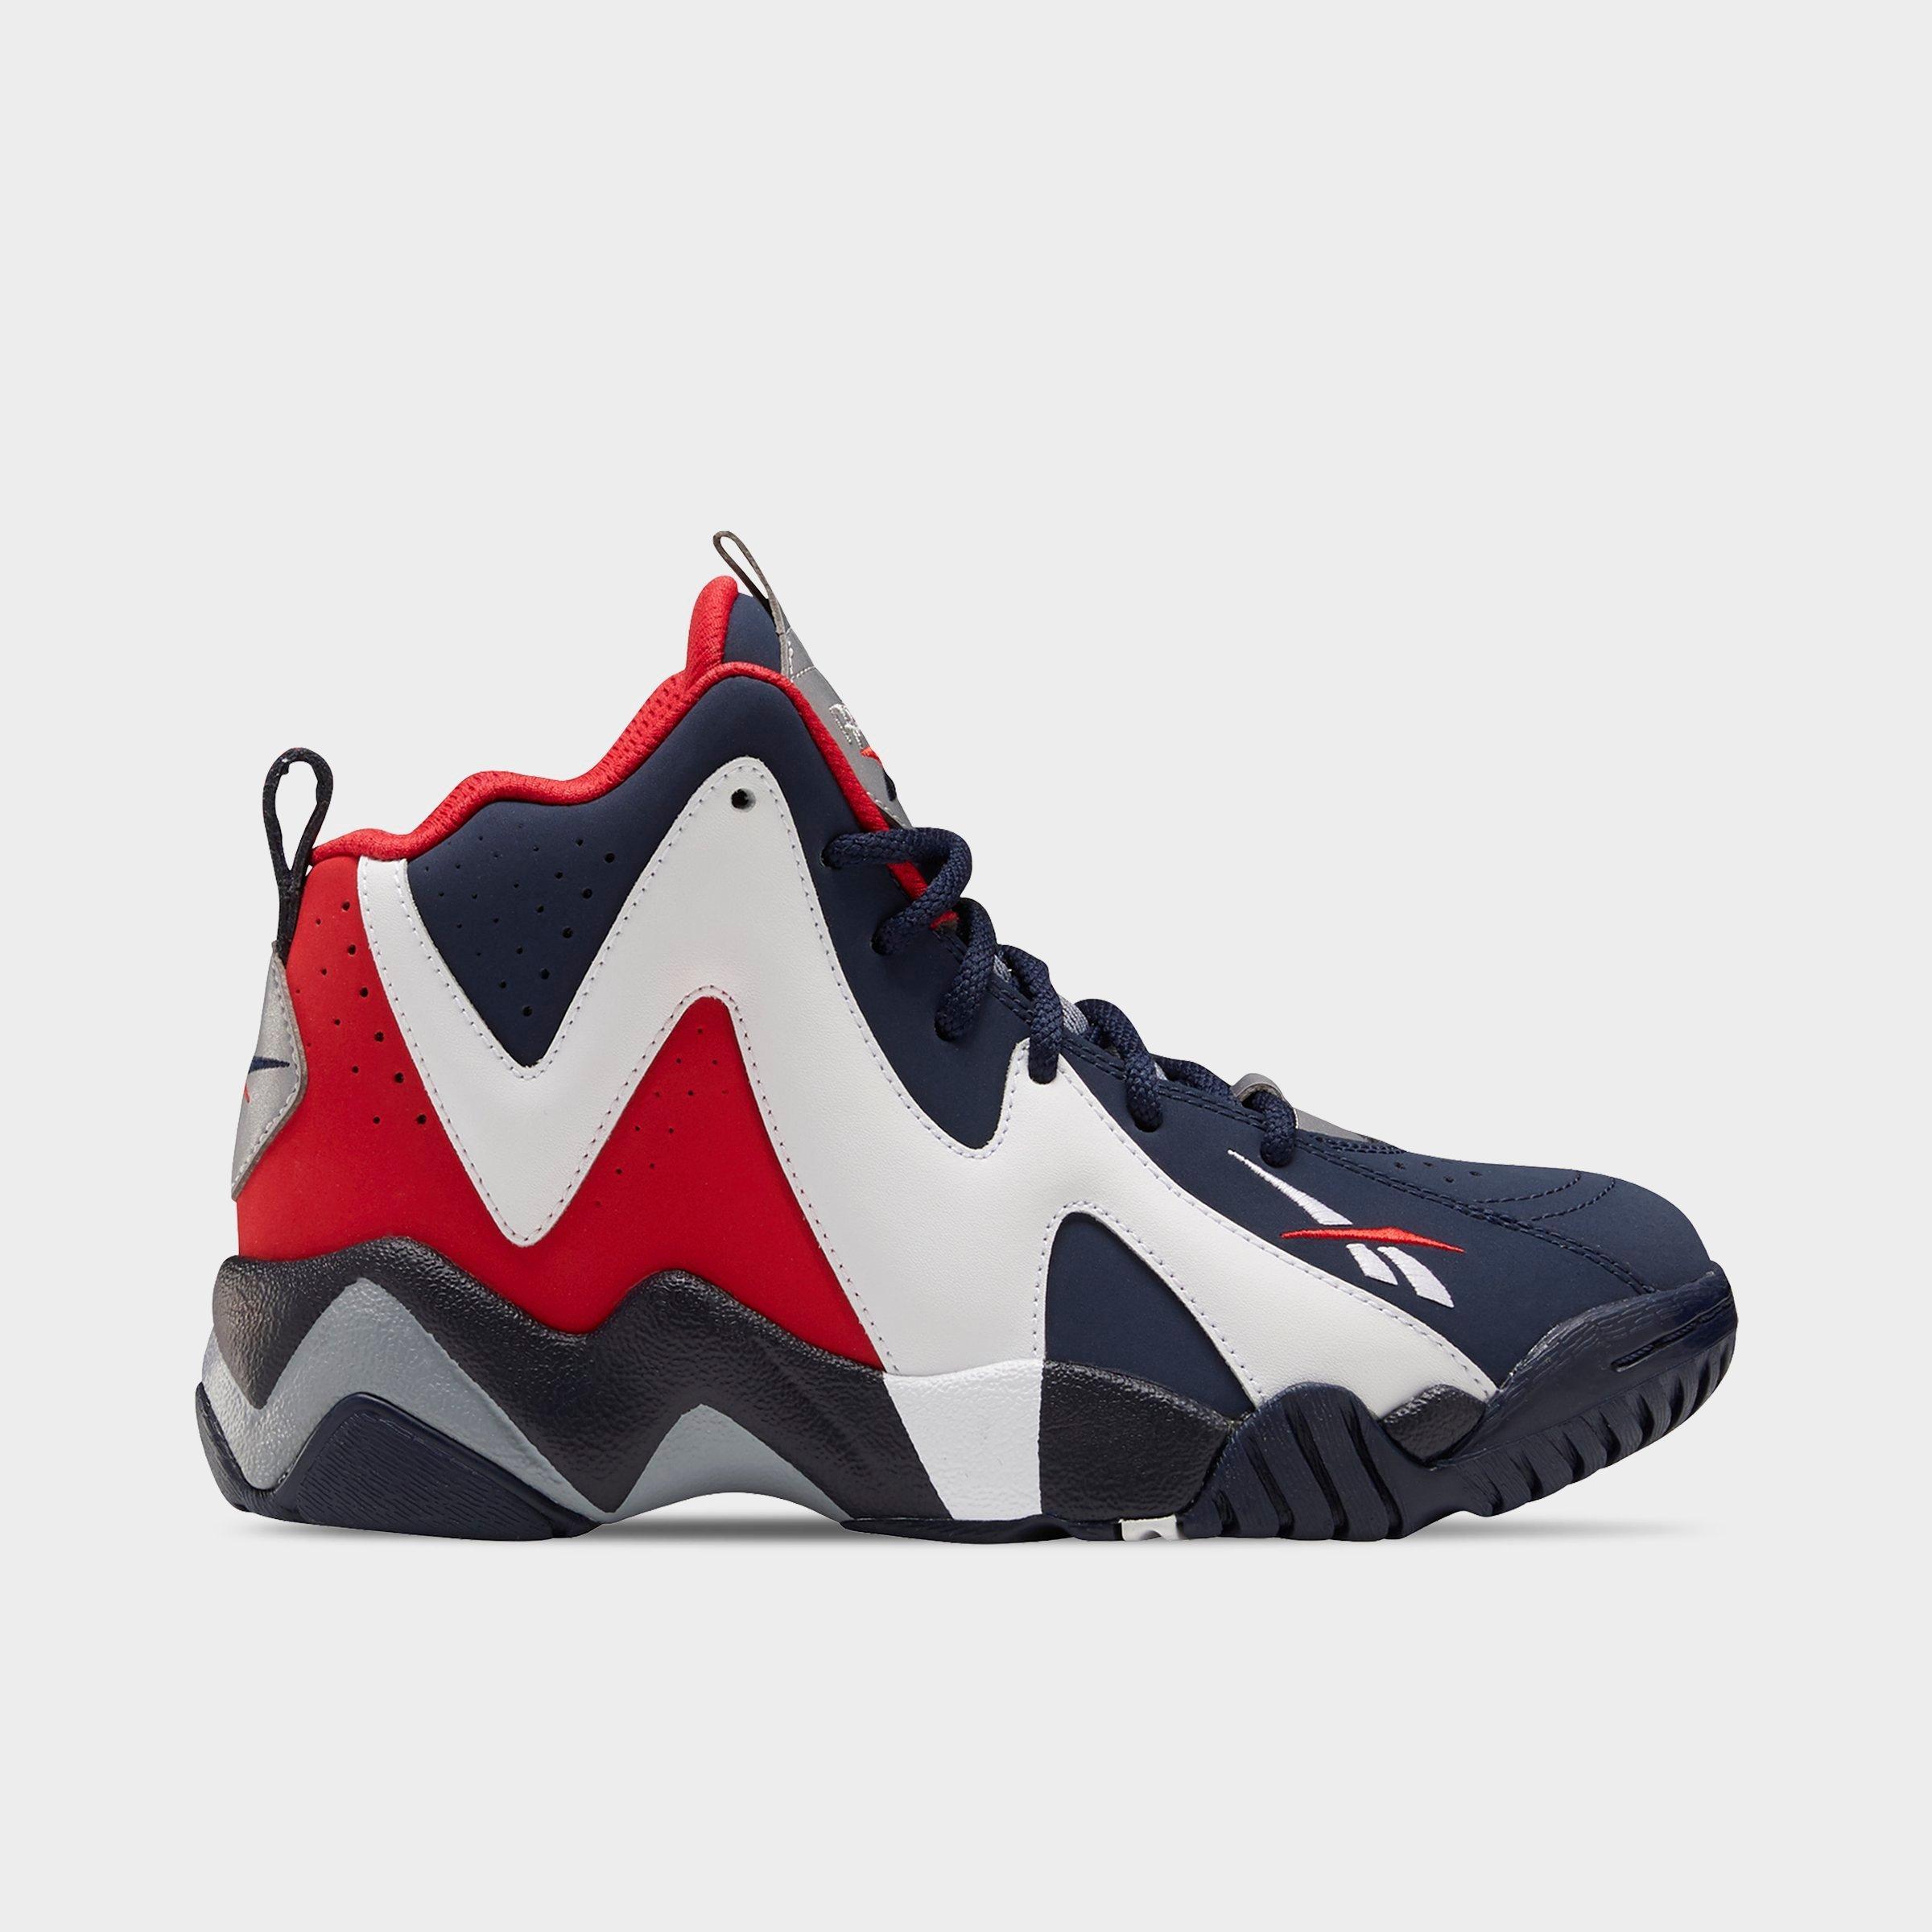 buy reebok kids shoes online